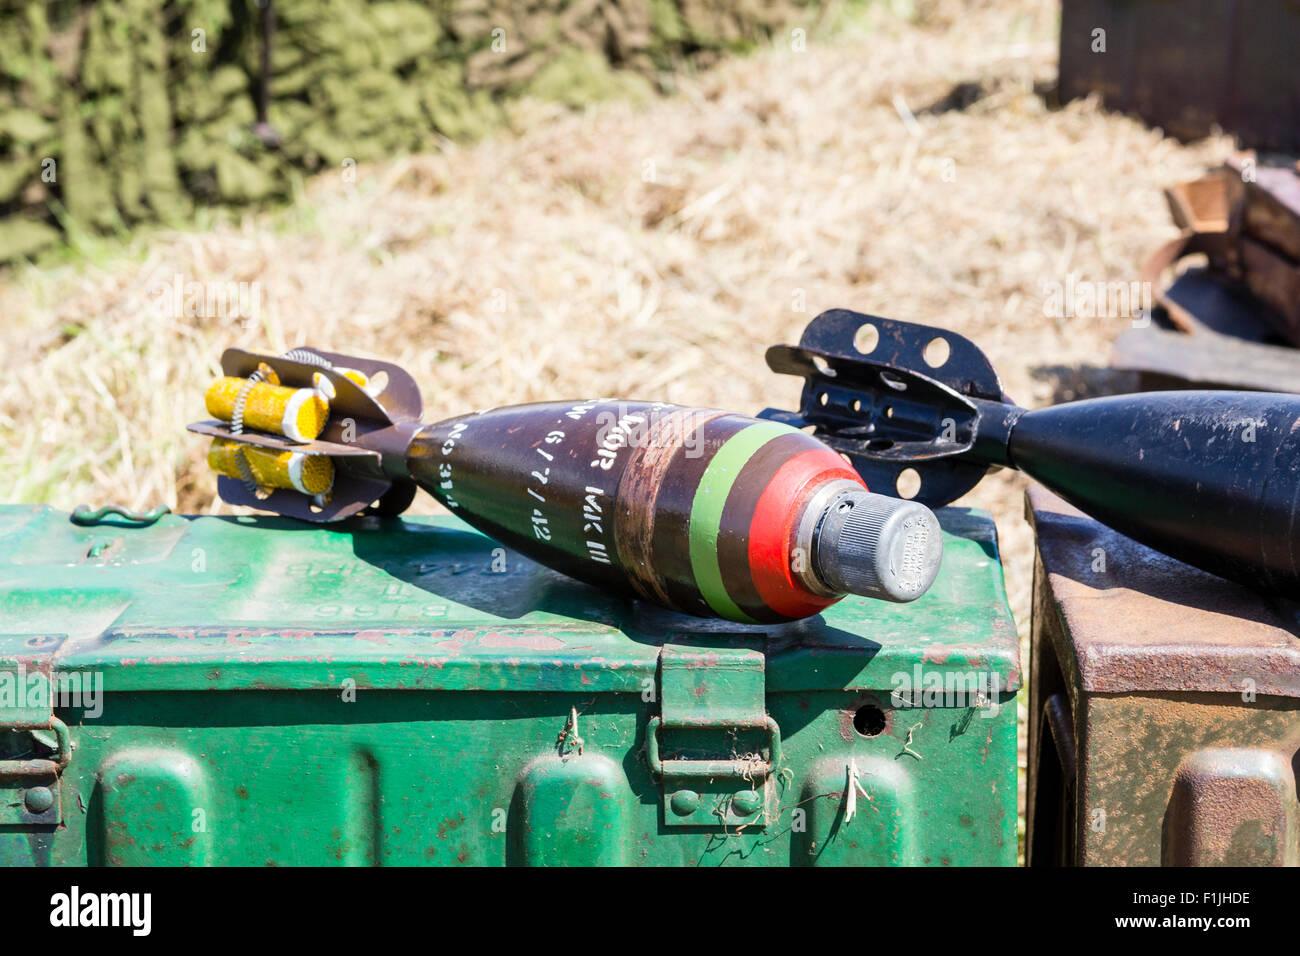 Second world war re-enactment. 3 inch morter bombs, mark 2, on sandbags - Stock Image